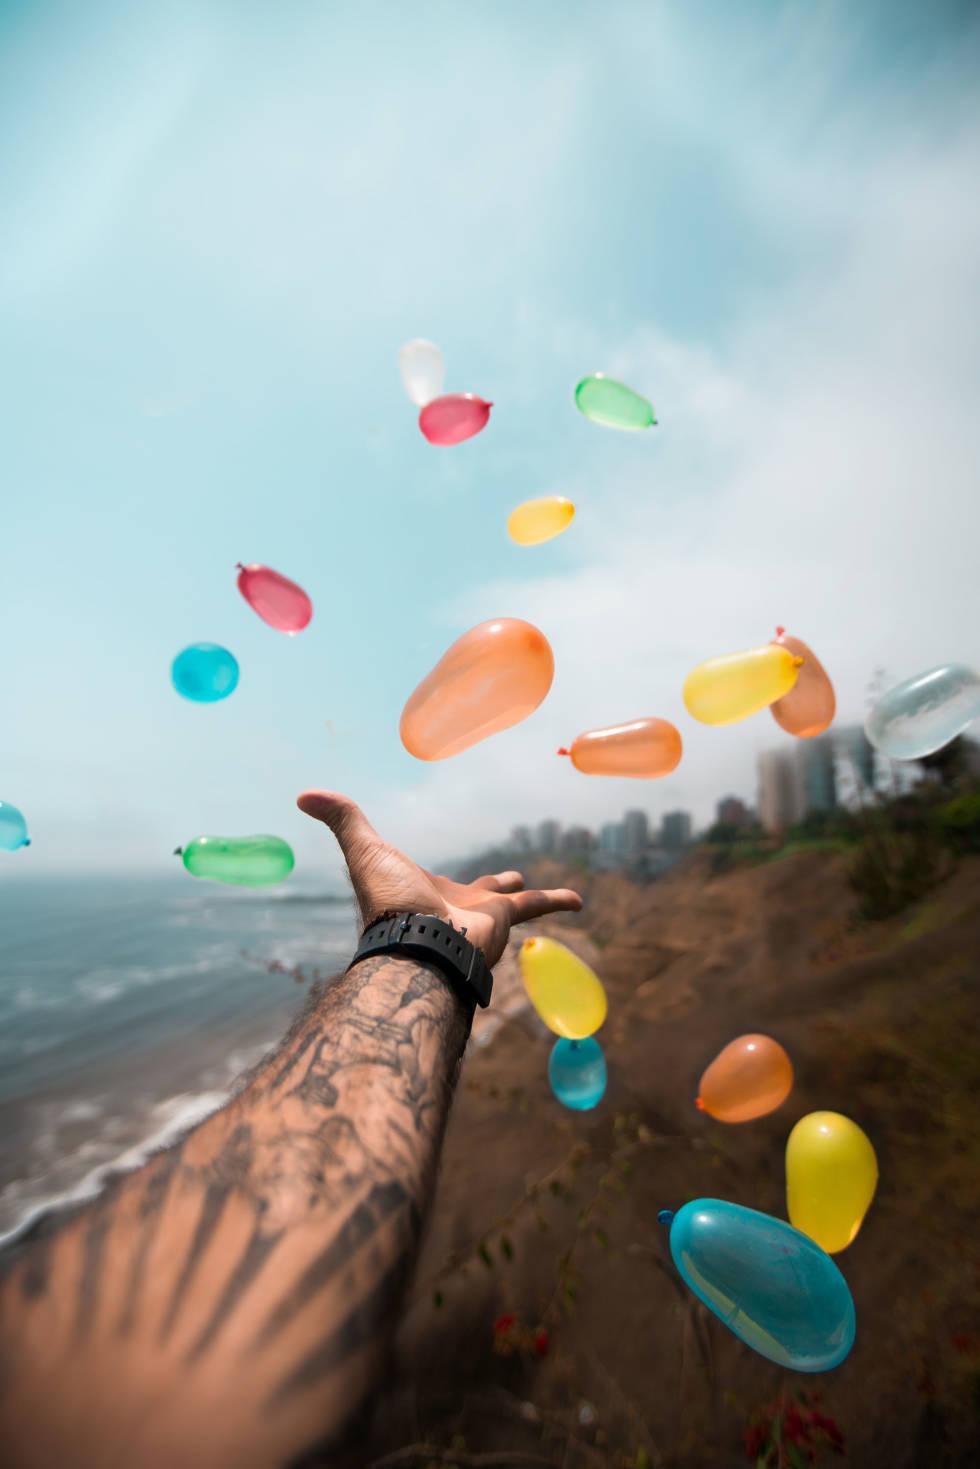 Image of someone throwing water balloons